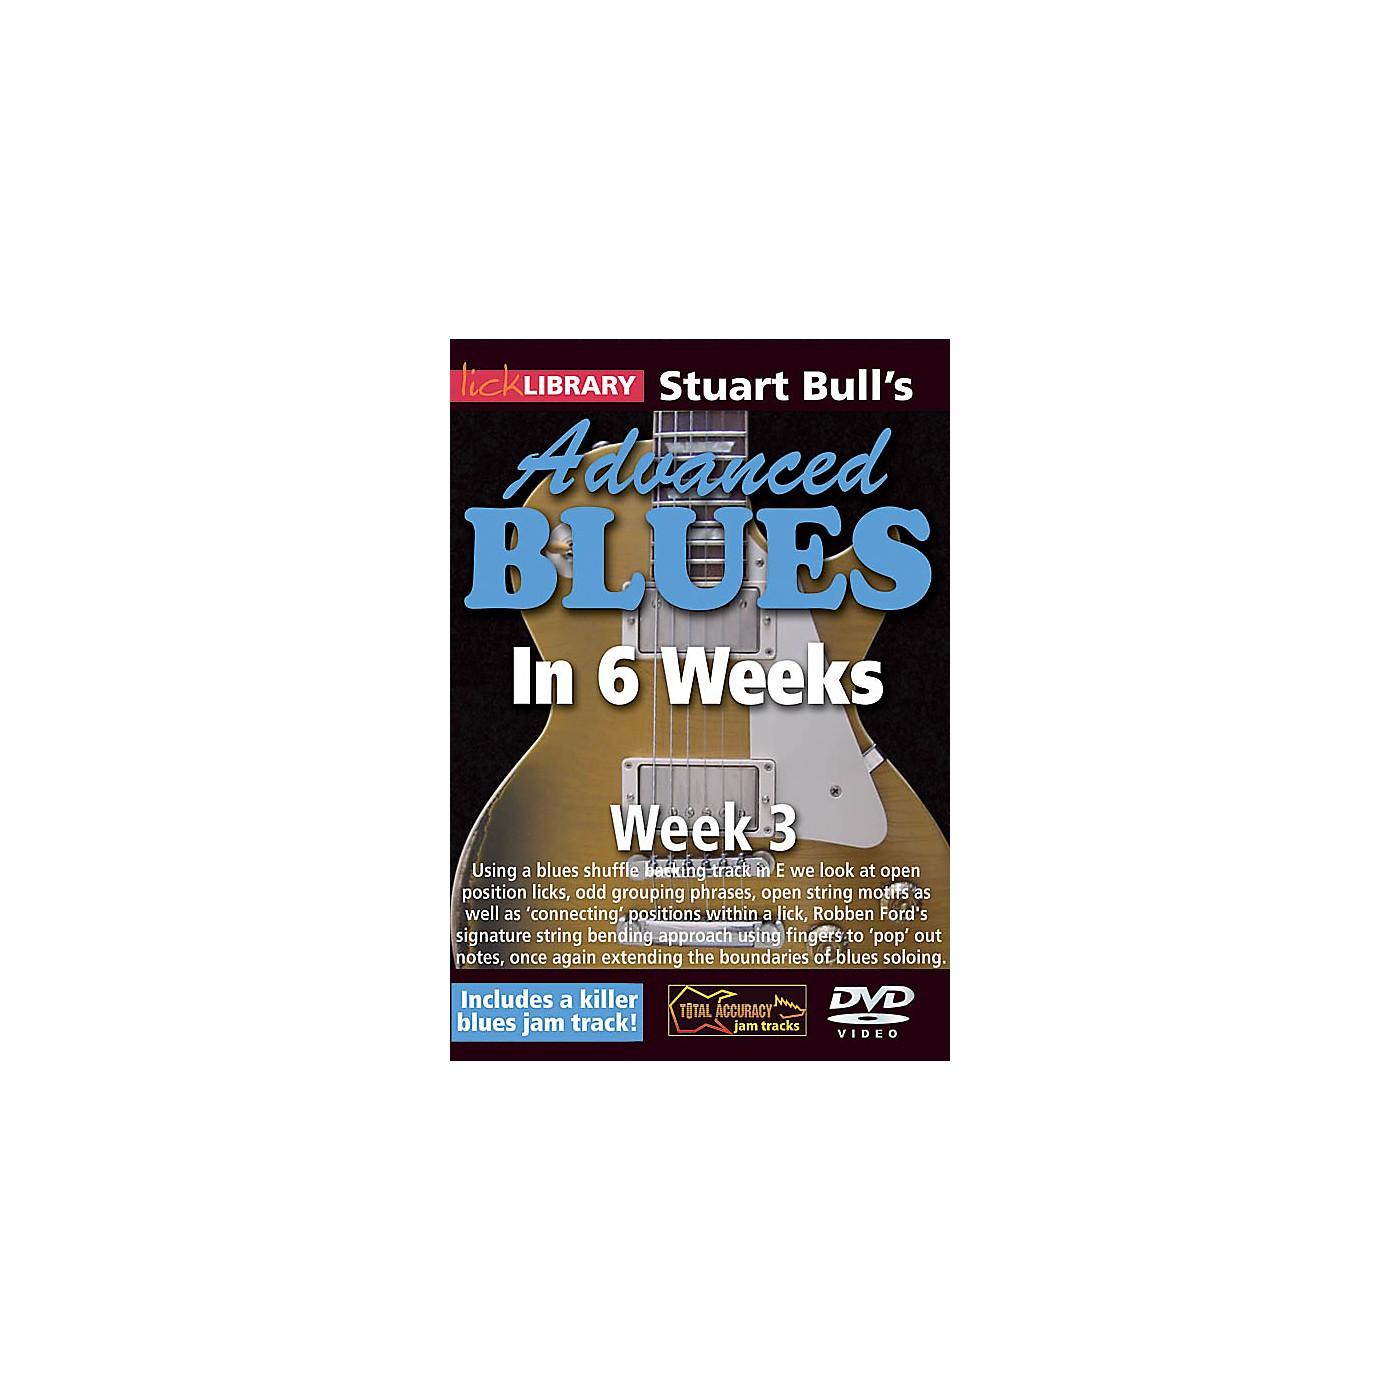 Licklibrary Stuart Bull's Advanced Blues in 6 Weeks (Week 3) Lick Library Series DVD Performed by Stuart Bull thumbnail